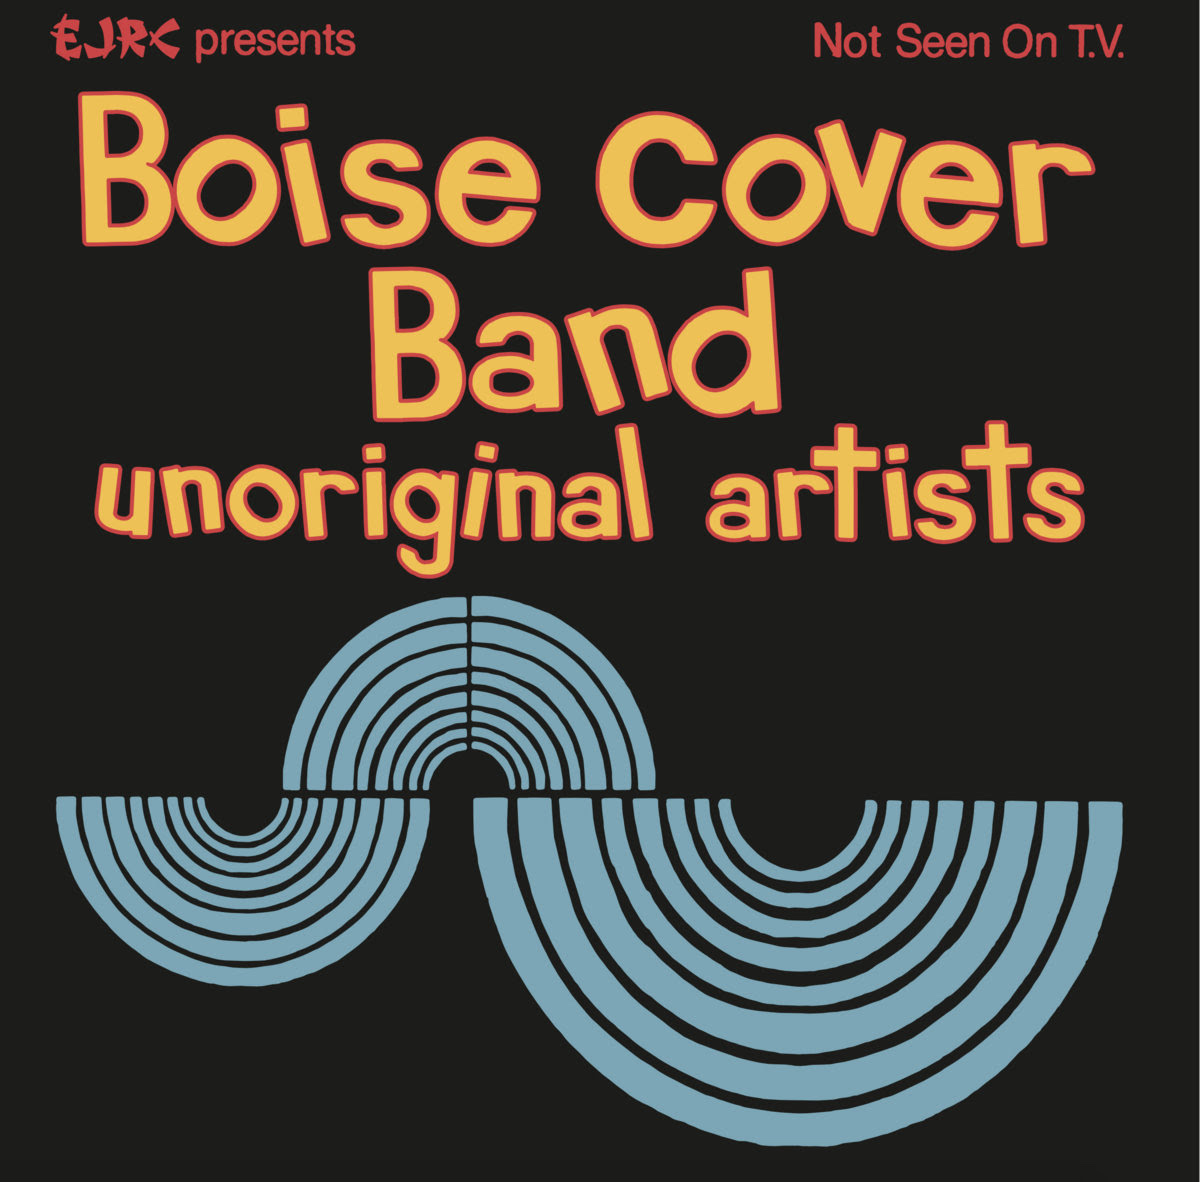 built to spill boise cover band david bowie unoriginal artists album cover art